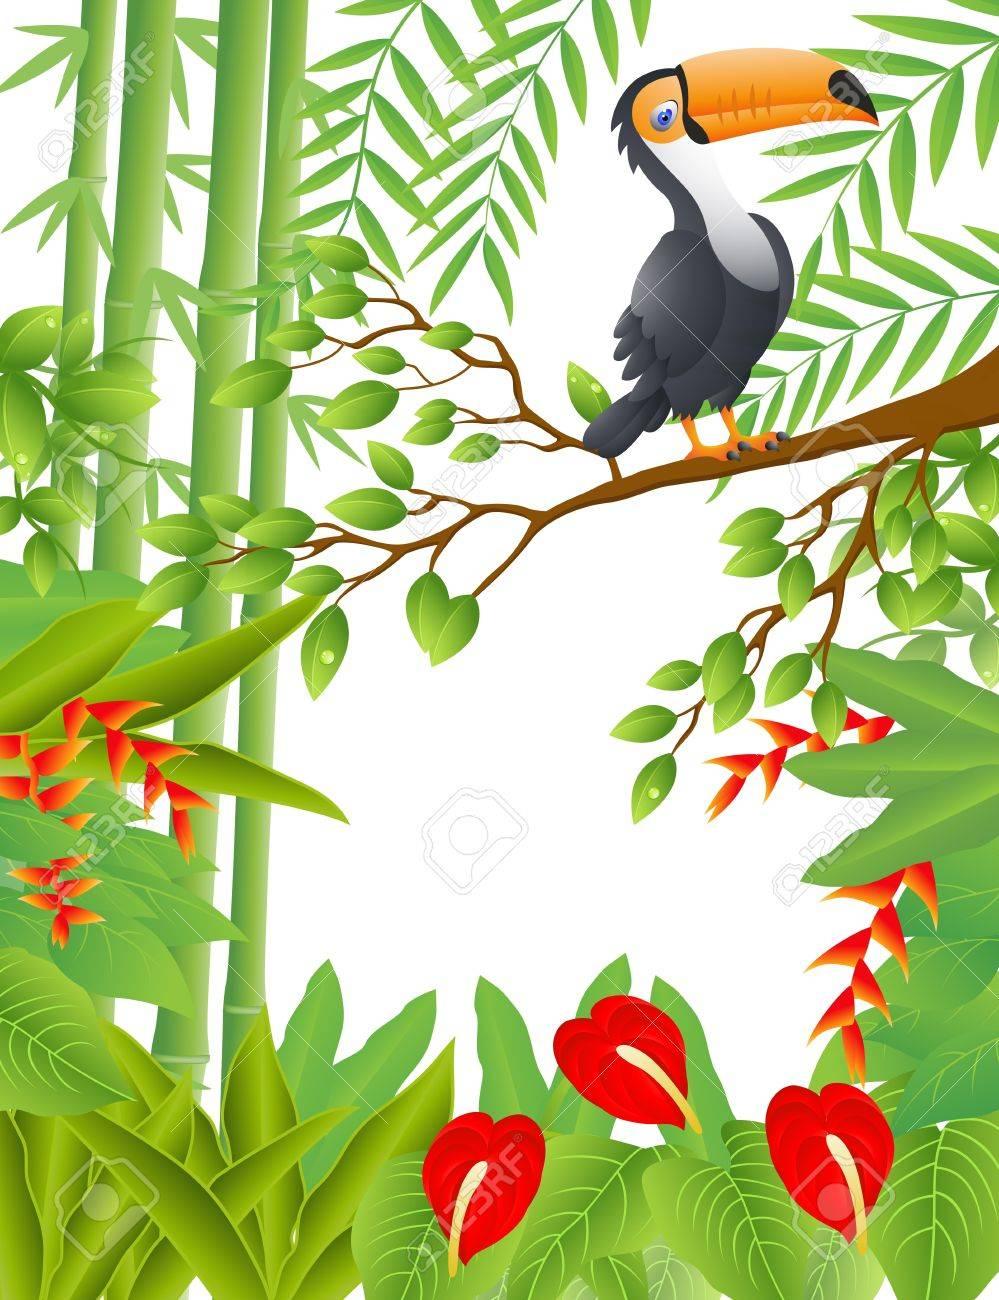 Vector Illustration Of toucan bird Stock Vector - 14805580